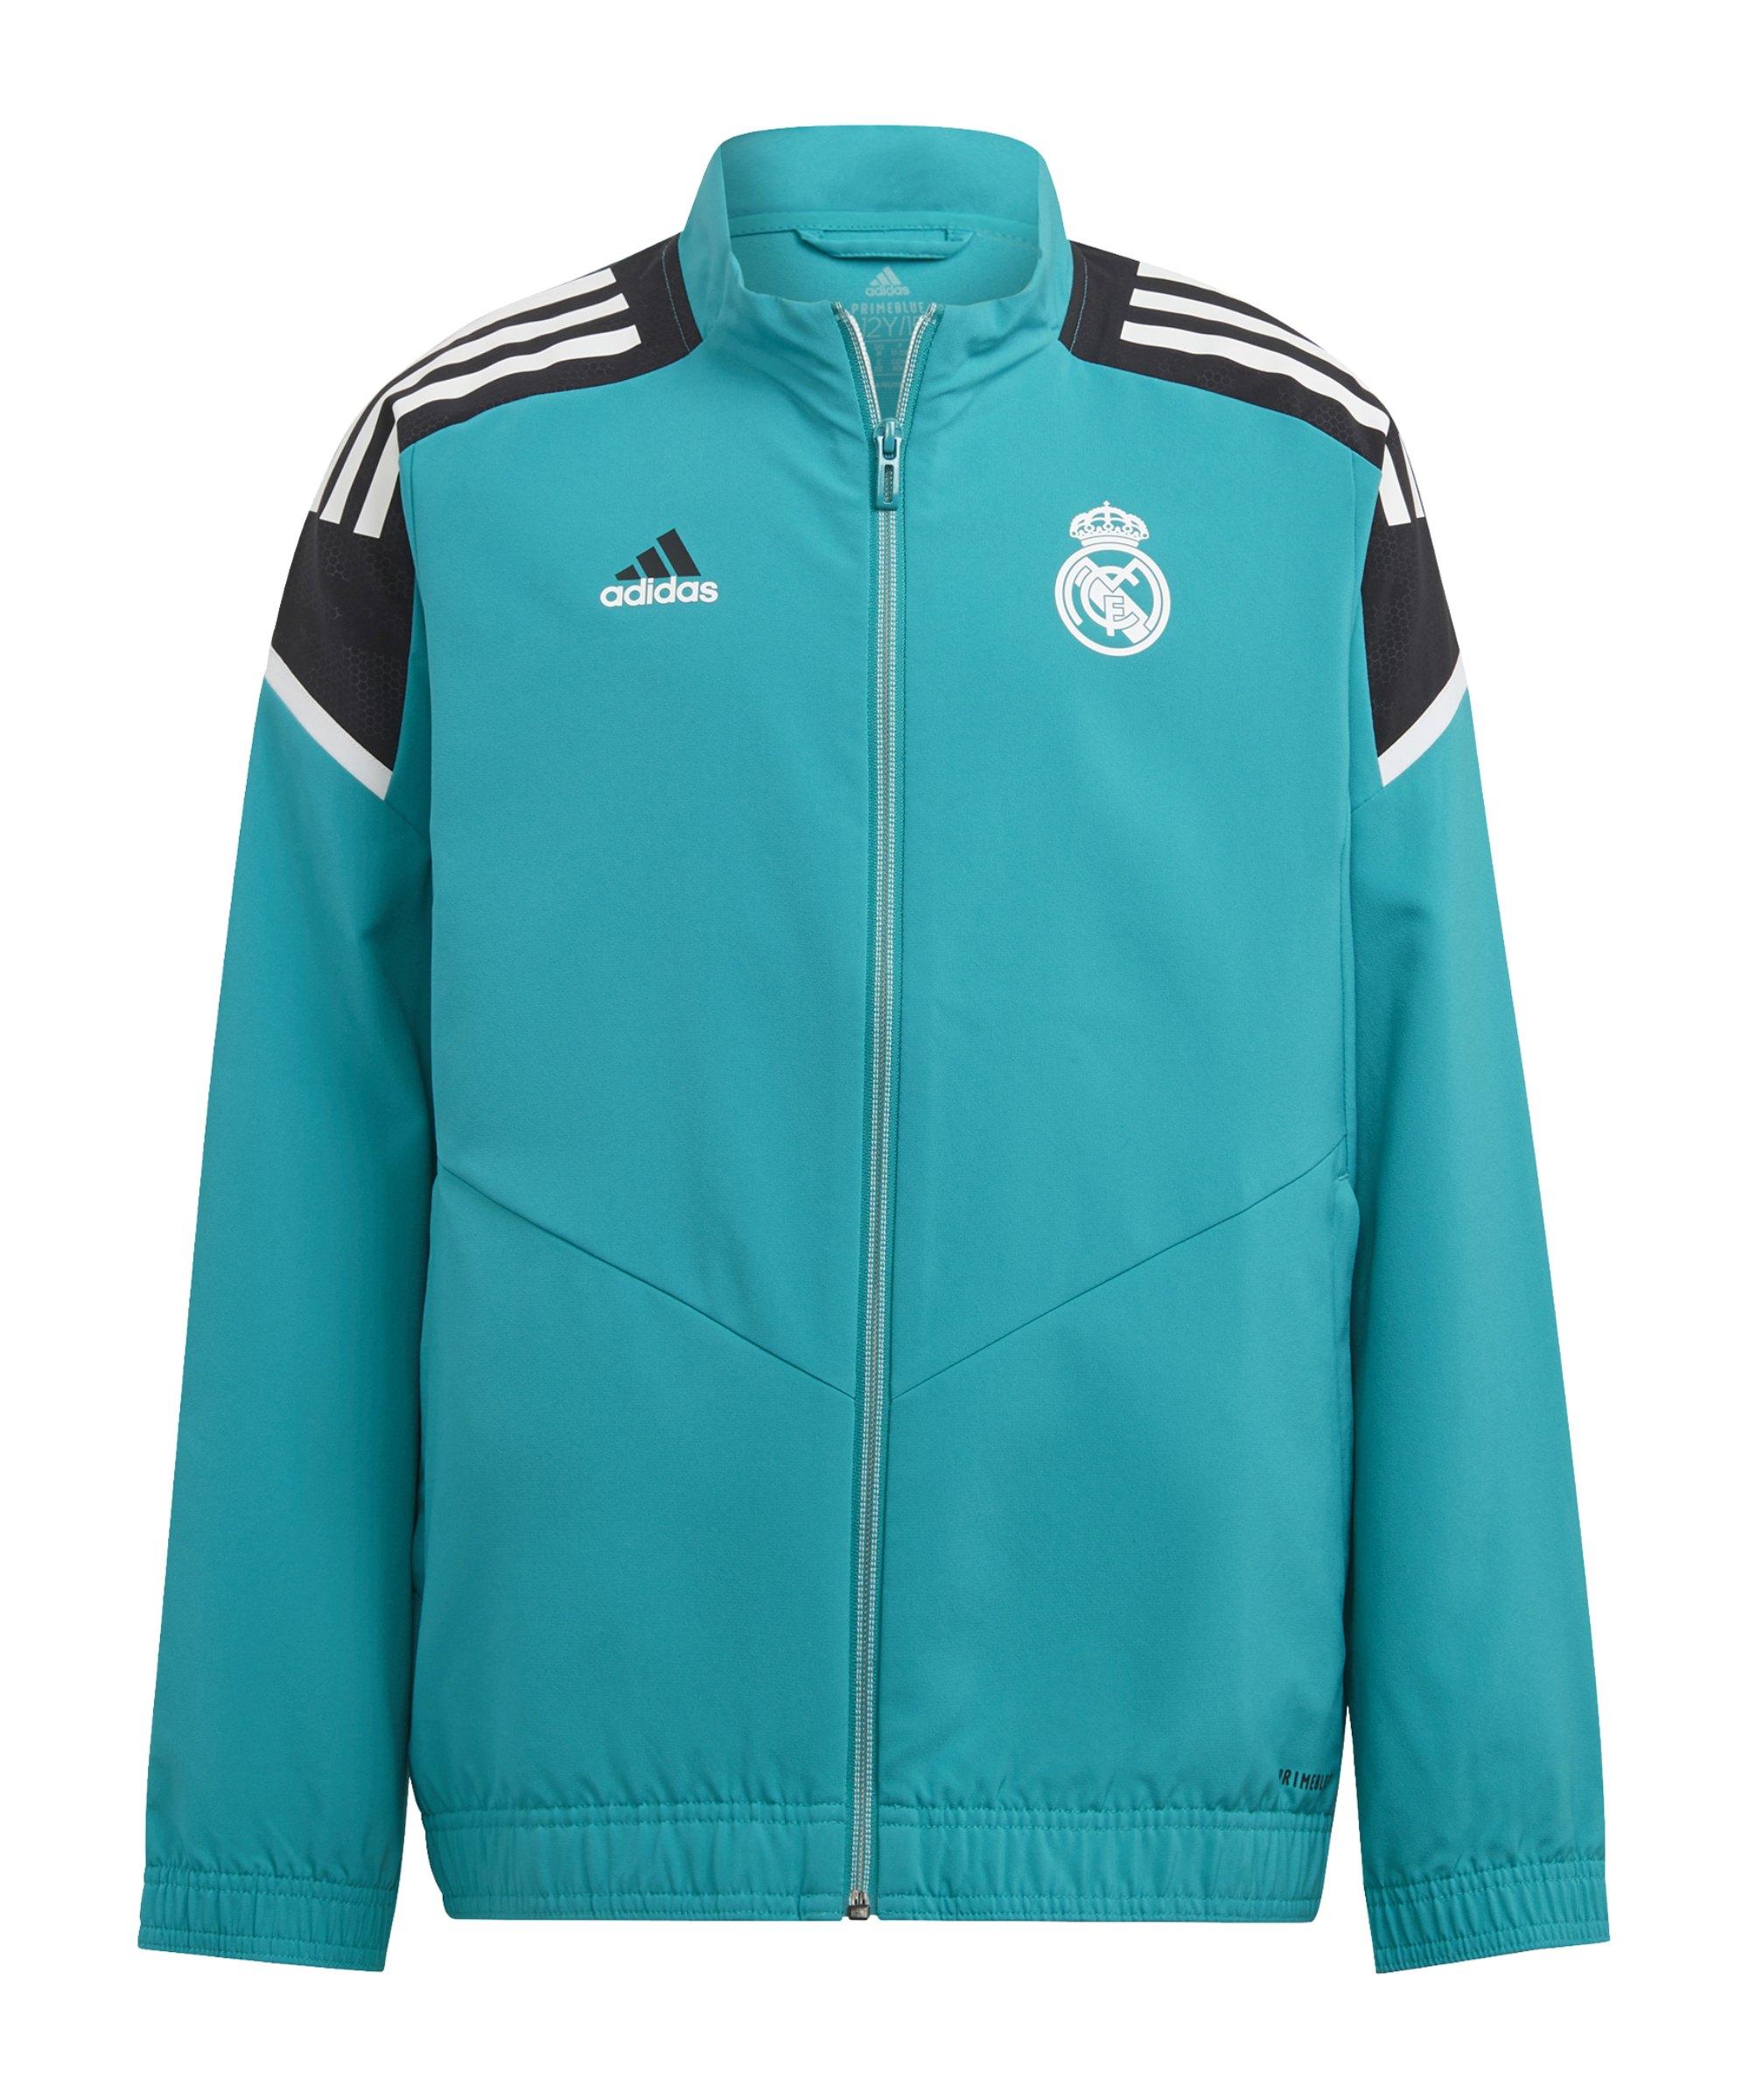 adidas Real Madrid Prematch Jacke 2021/2022 Kids Grün - gruen